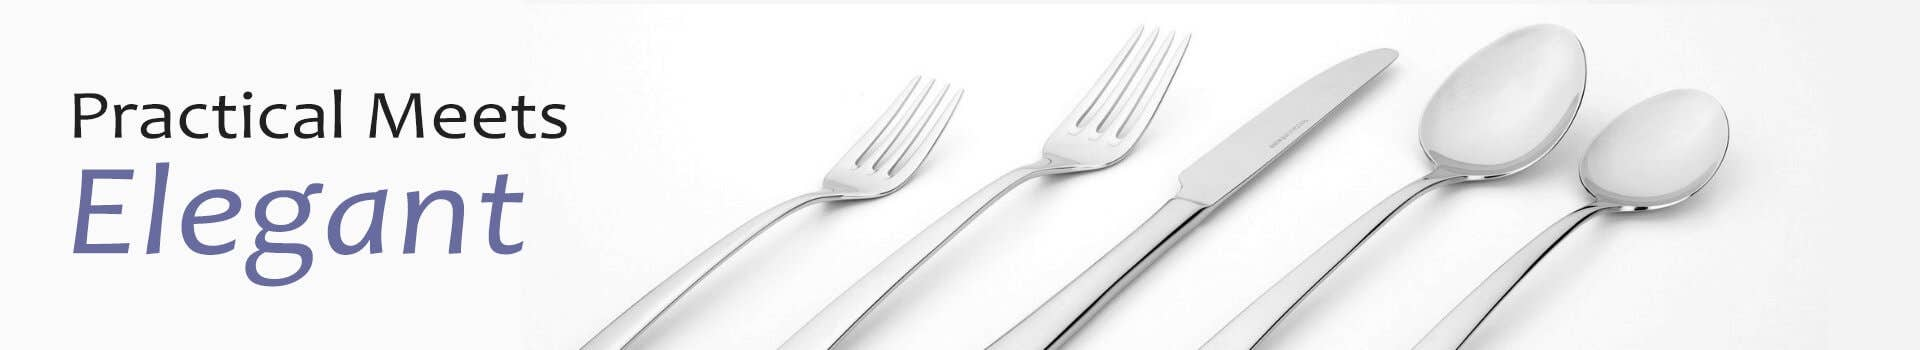 White Chopstick Rests